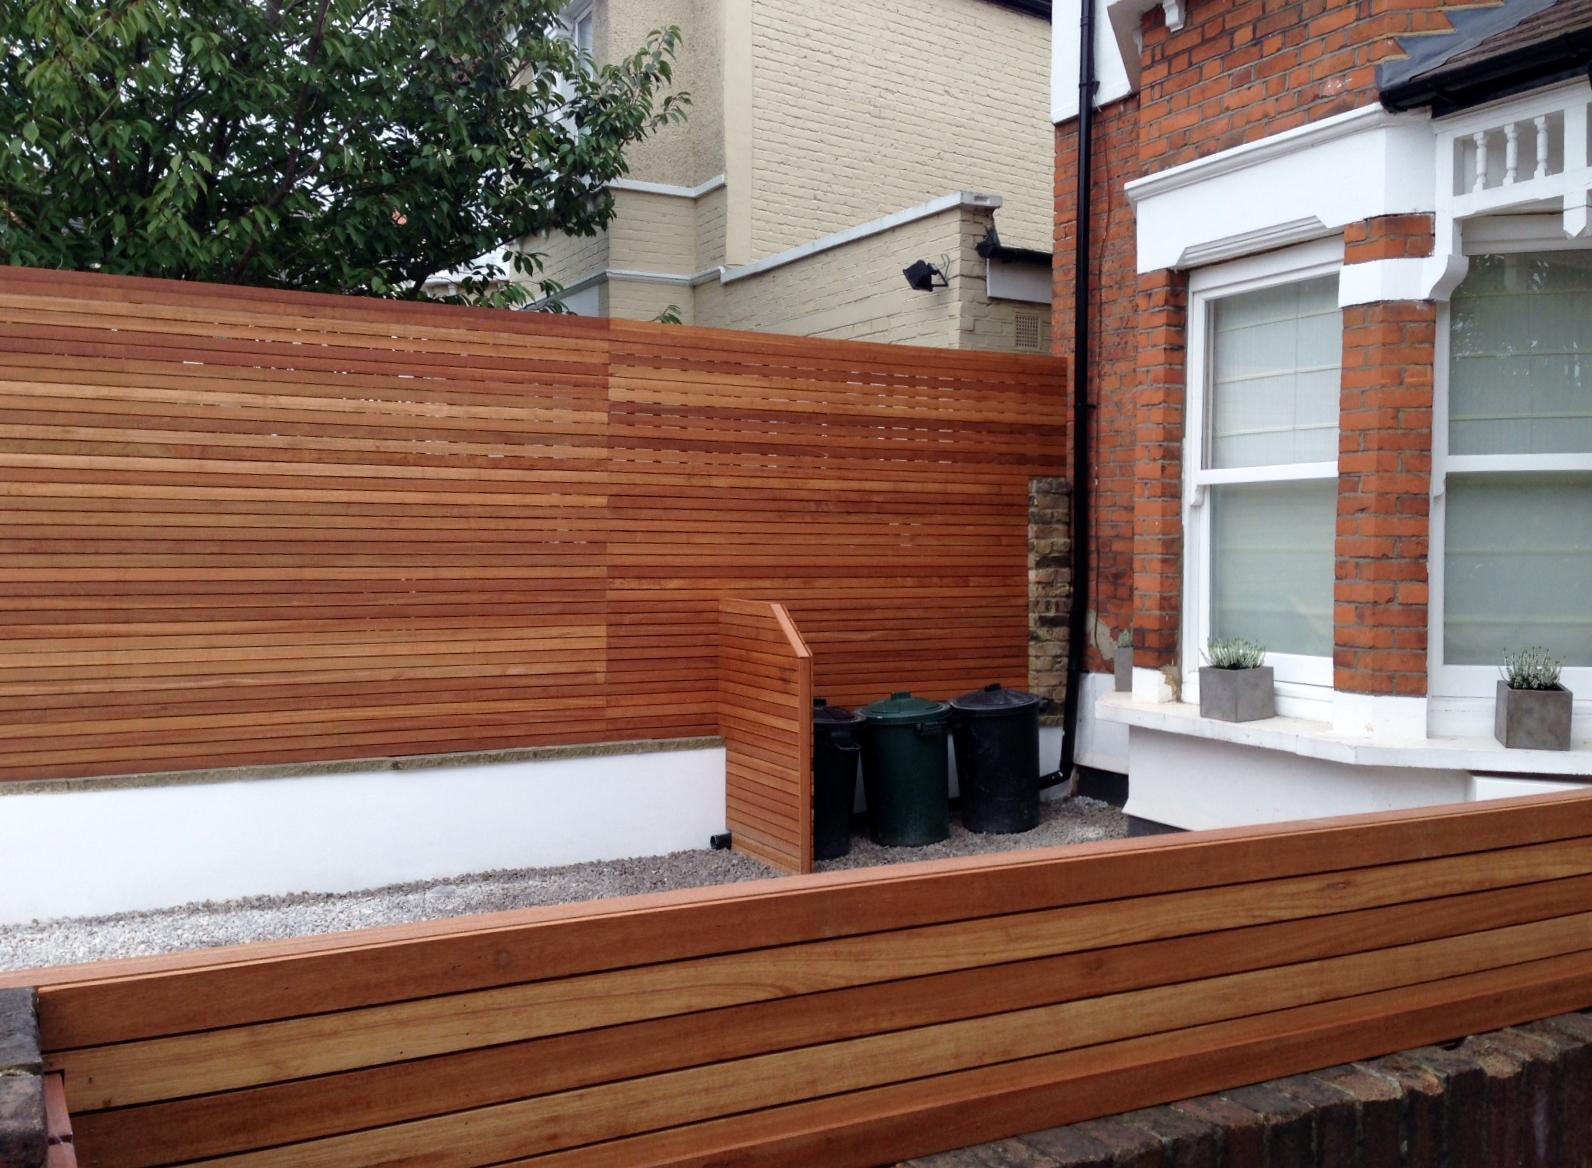 front garden drivewat gravel travertine paving path hardwood privacy screen trellis tooting london (24)